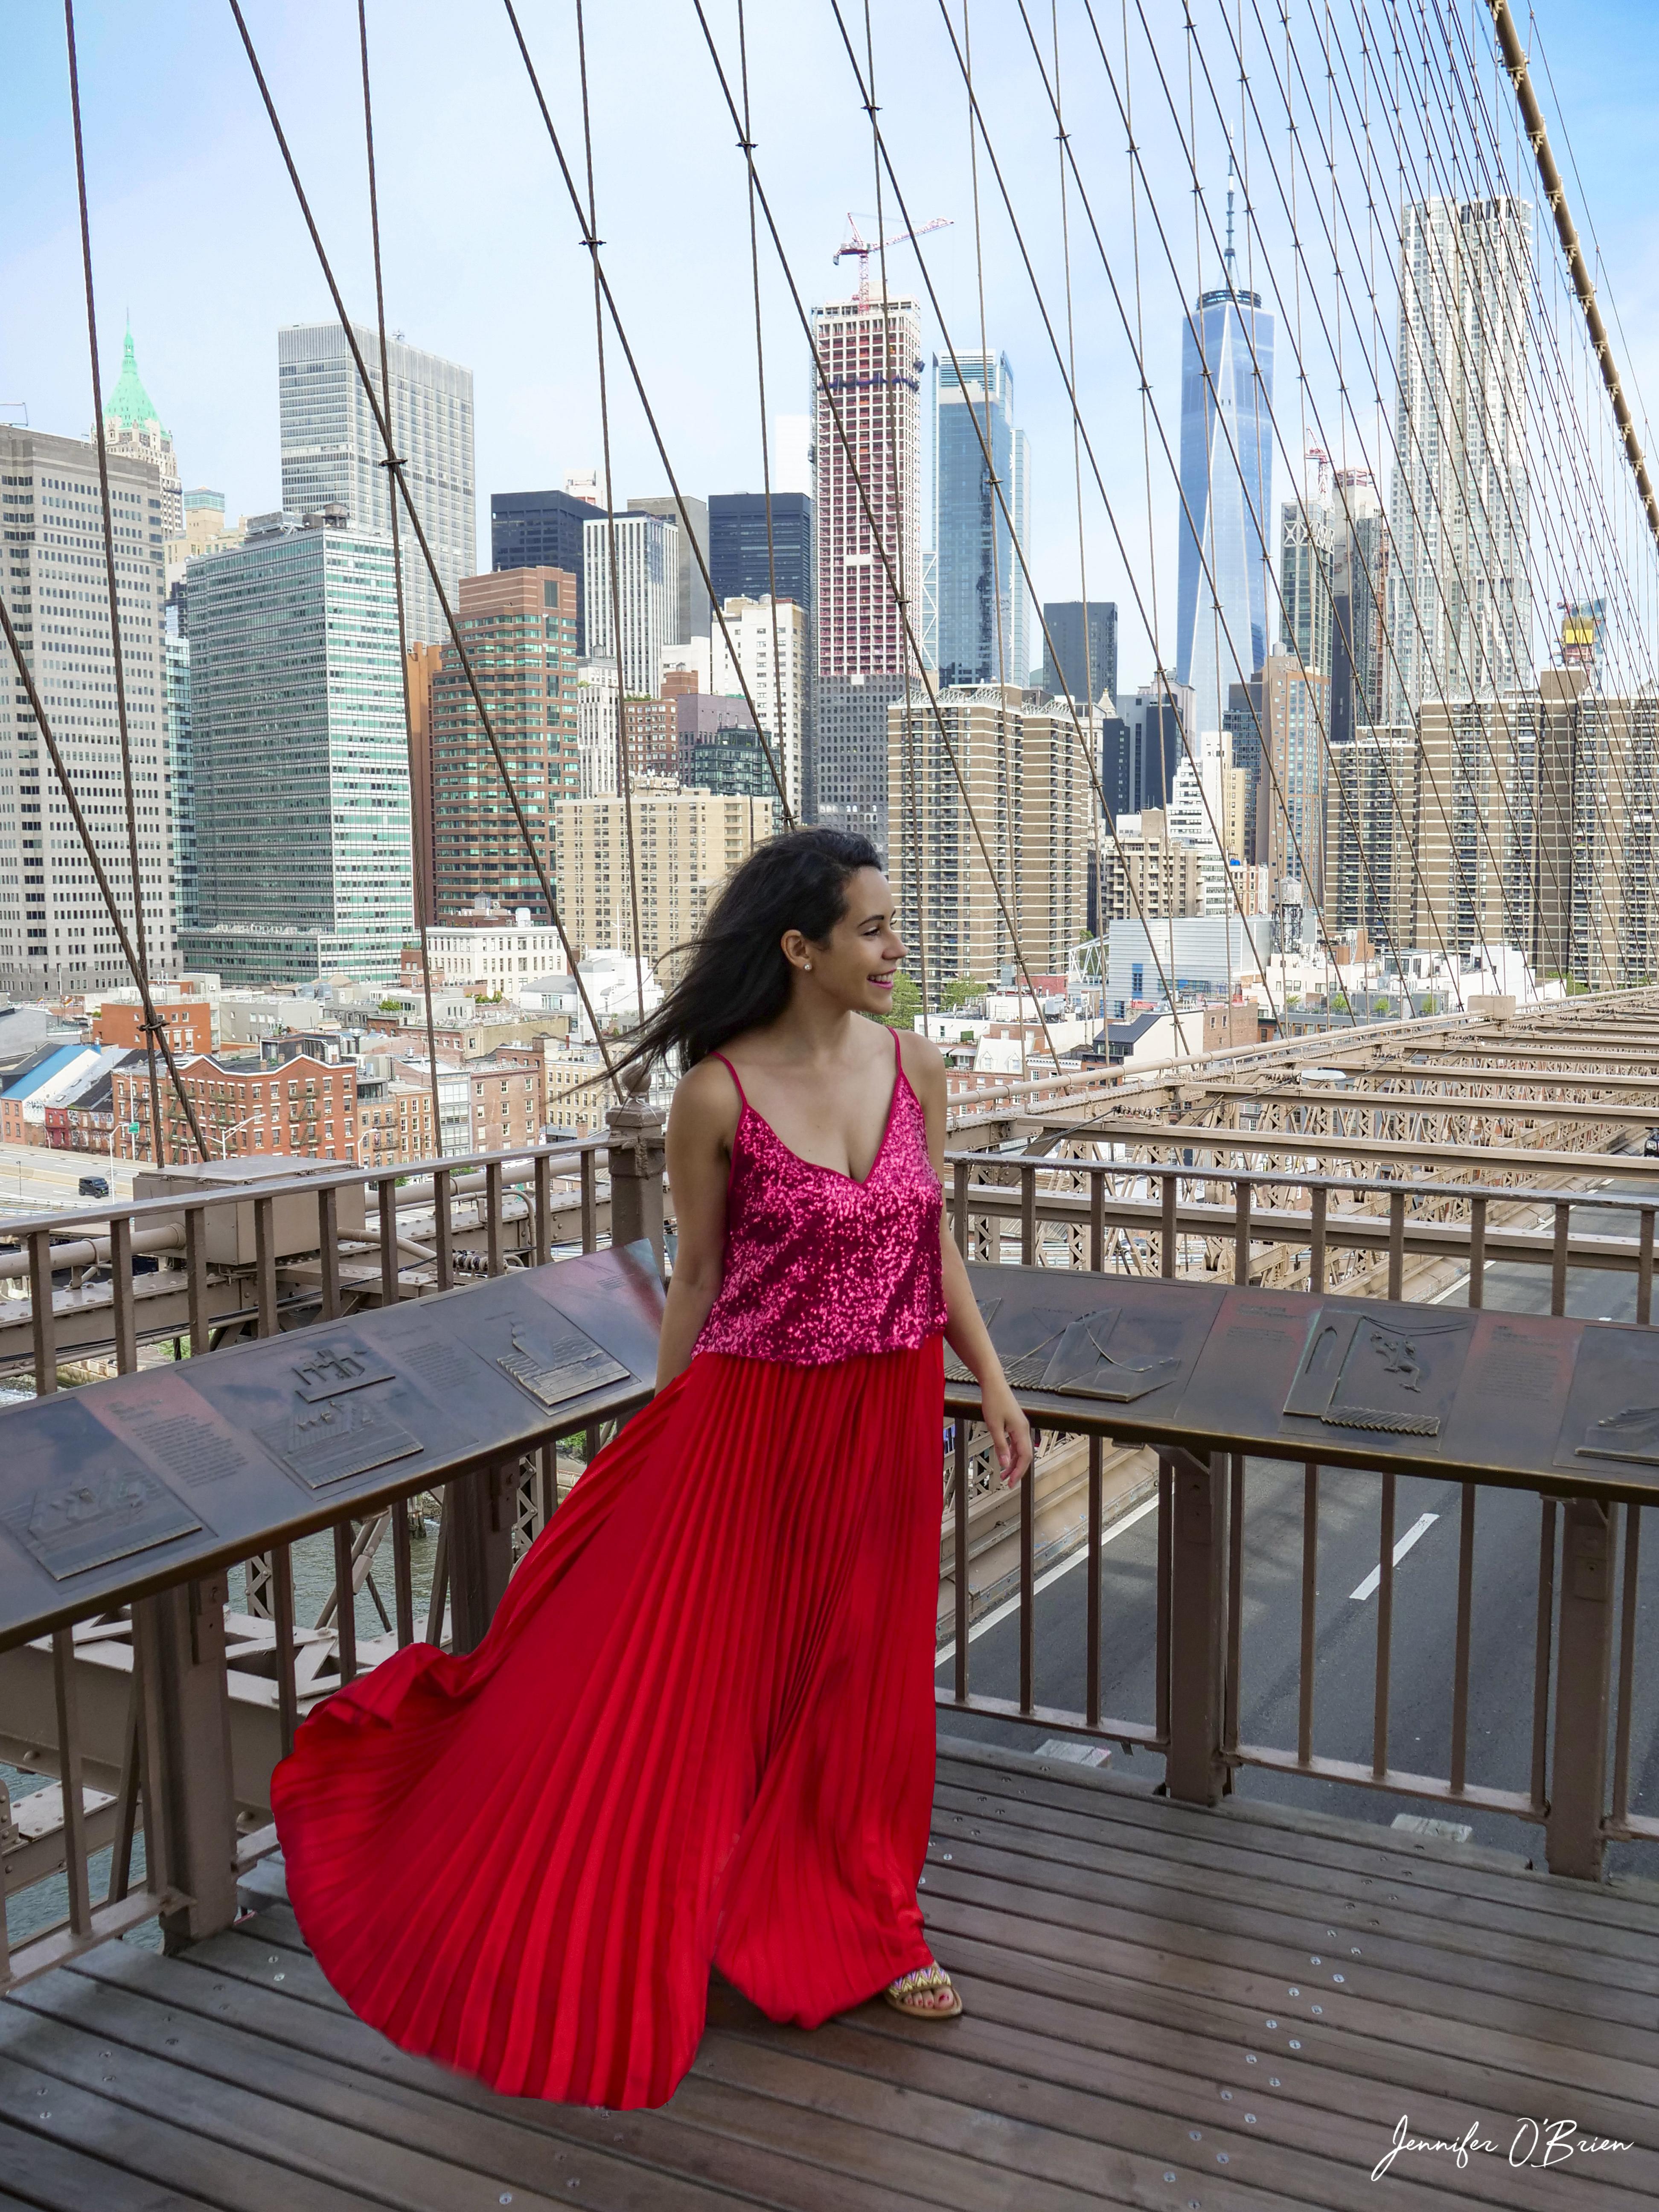 Top Instagram Photos of the Brooklyn Bridge The Travel Women girl in red dress